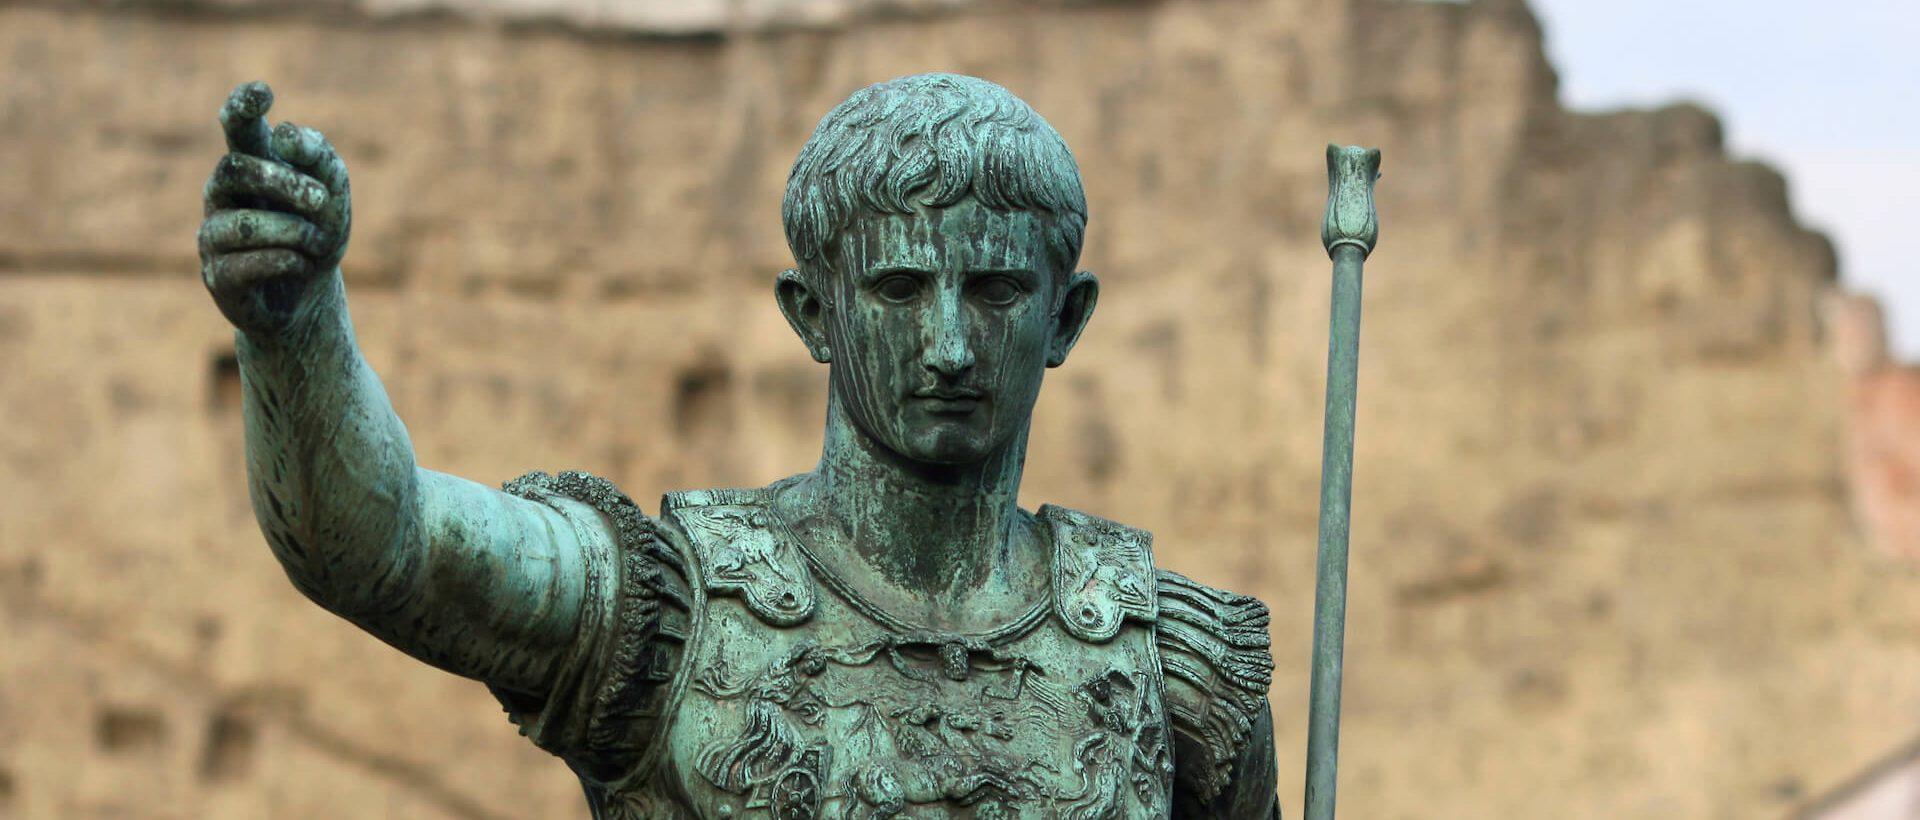 Hoe helpt stoïcisme tegen stress? 5 Lessen van Cato